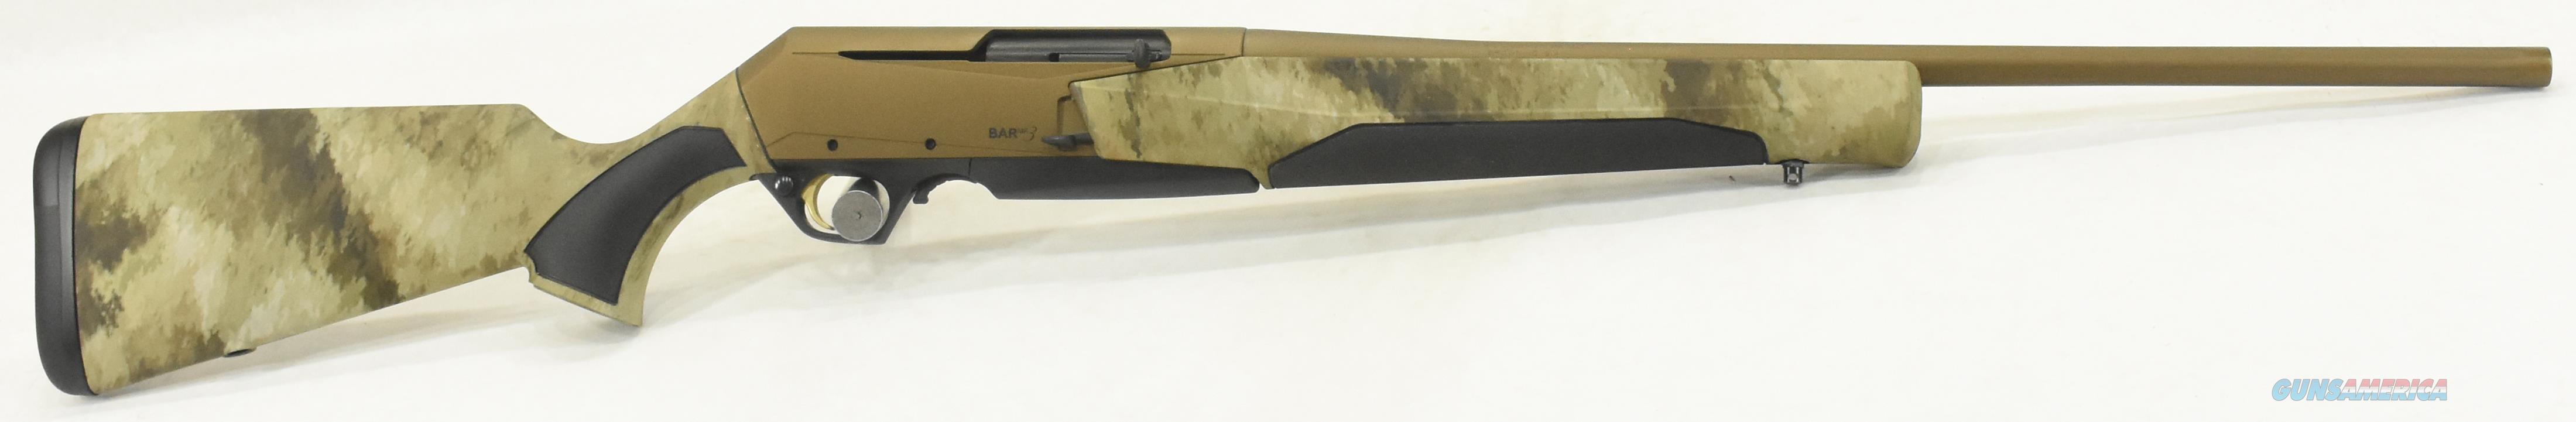 031064224 Browning BAR Mark III Hells Canyon Speed 270 Win  Guns > Rifles > Browning Rifles > Semi Auto > Hunting